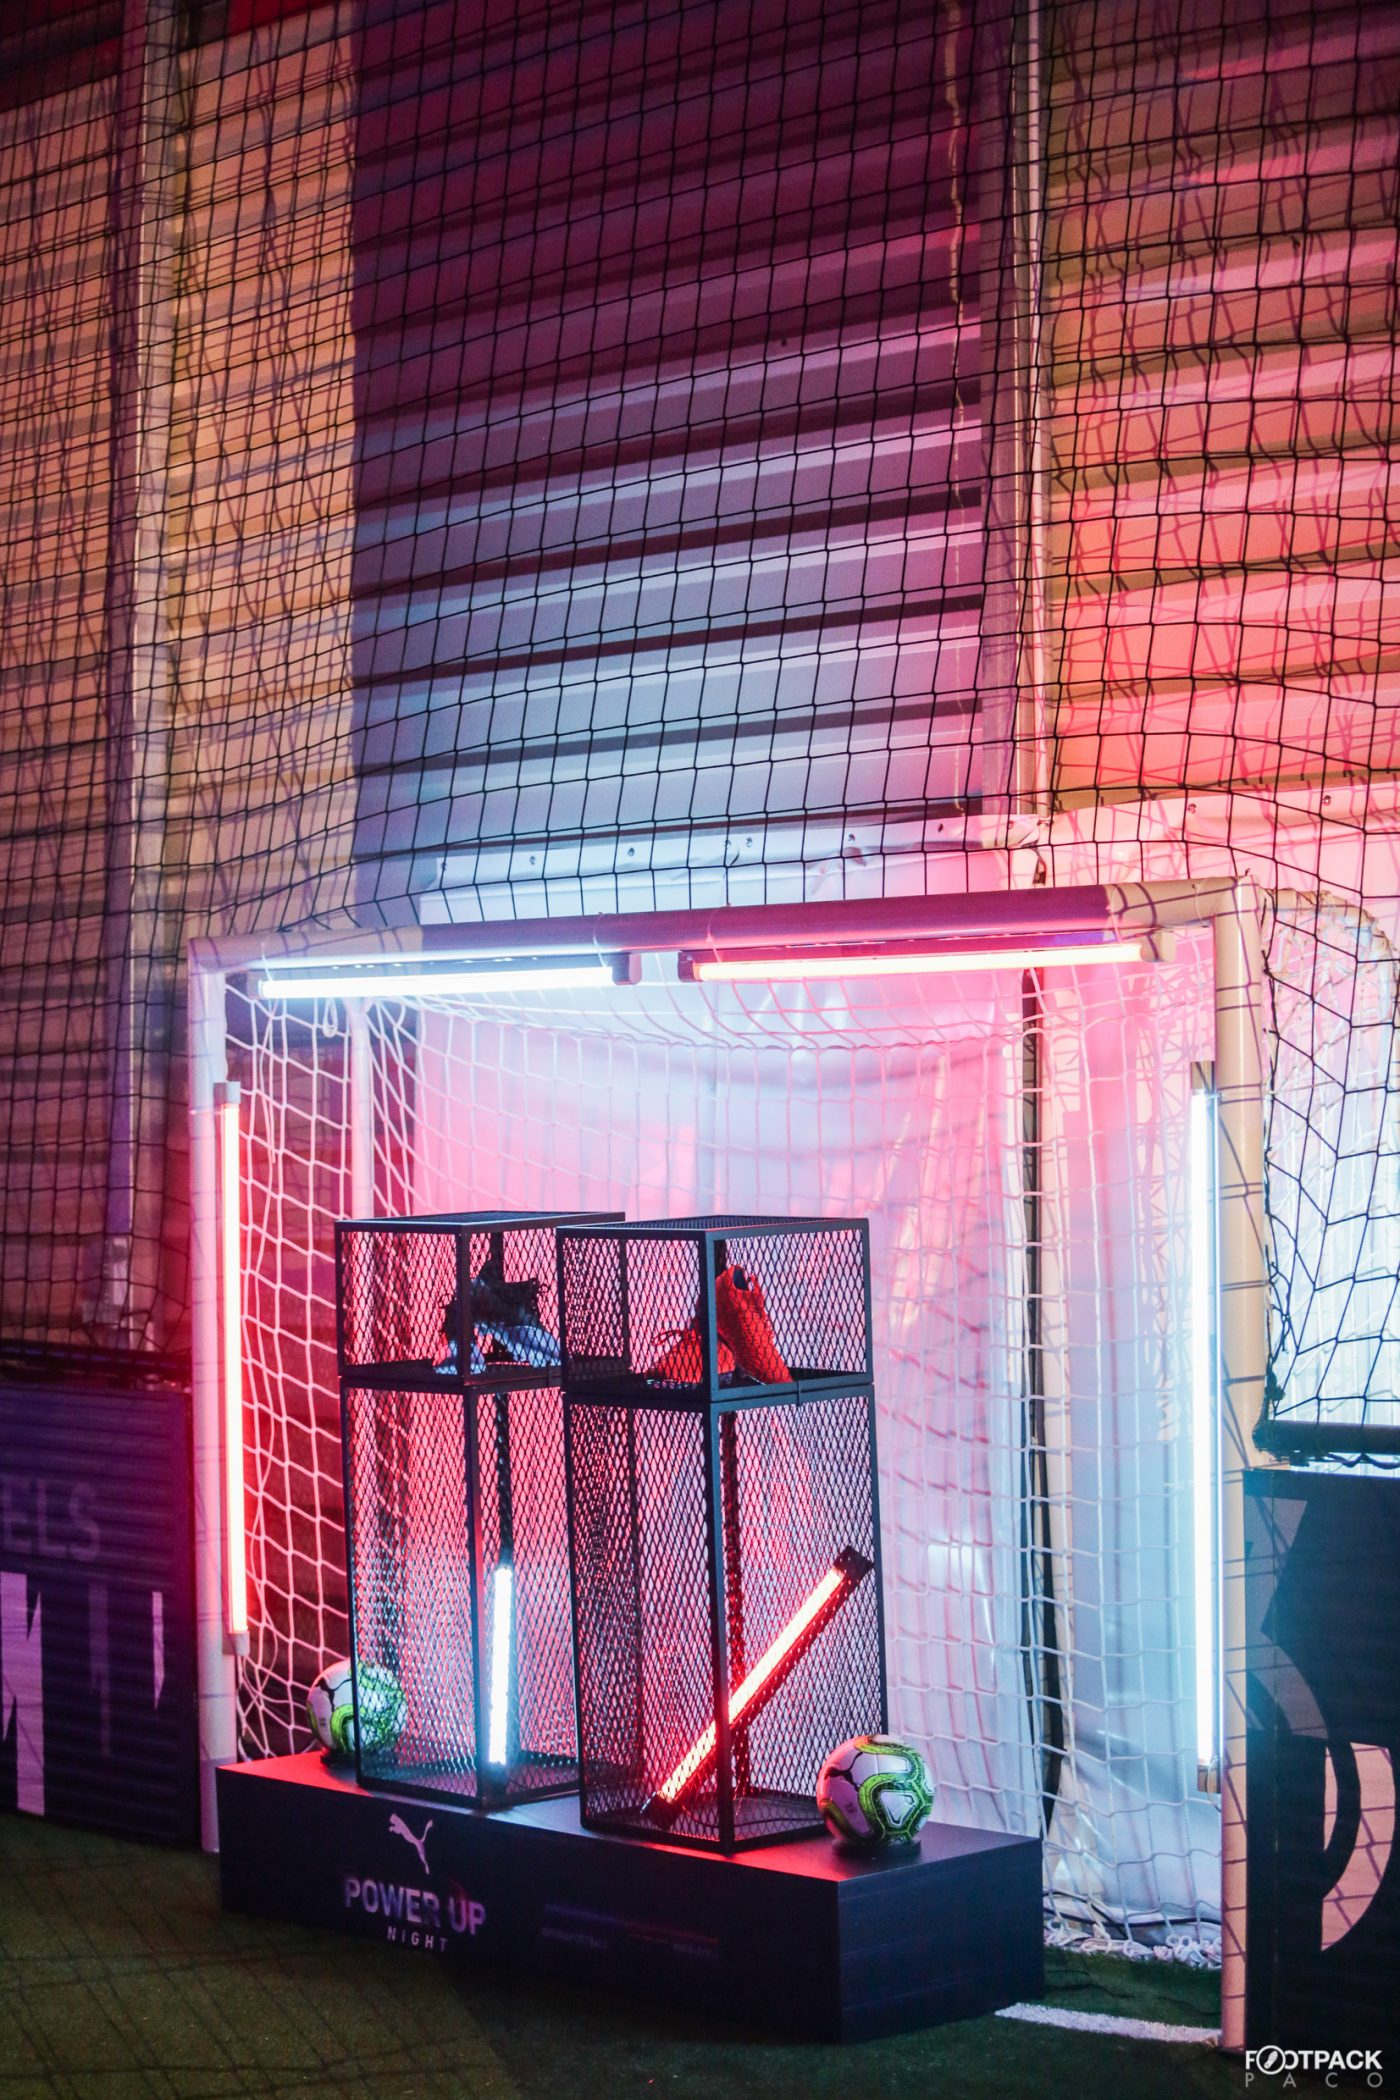 puma-power-up-night-marseille-footpack-février-2019-1